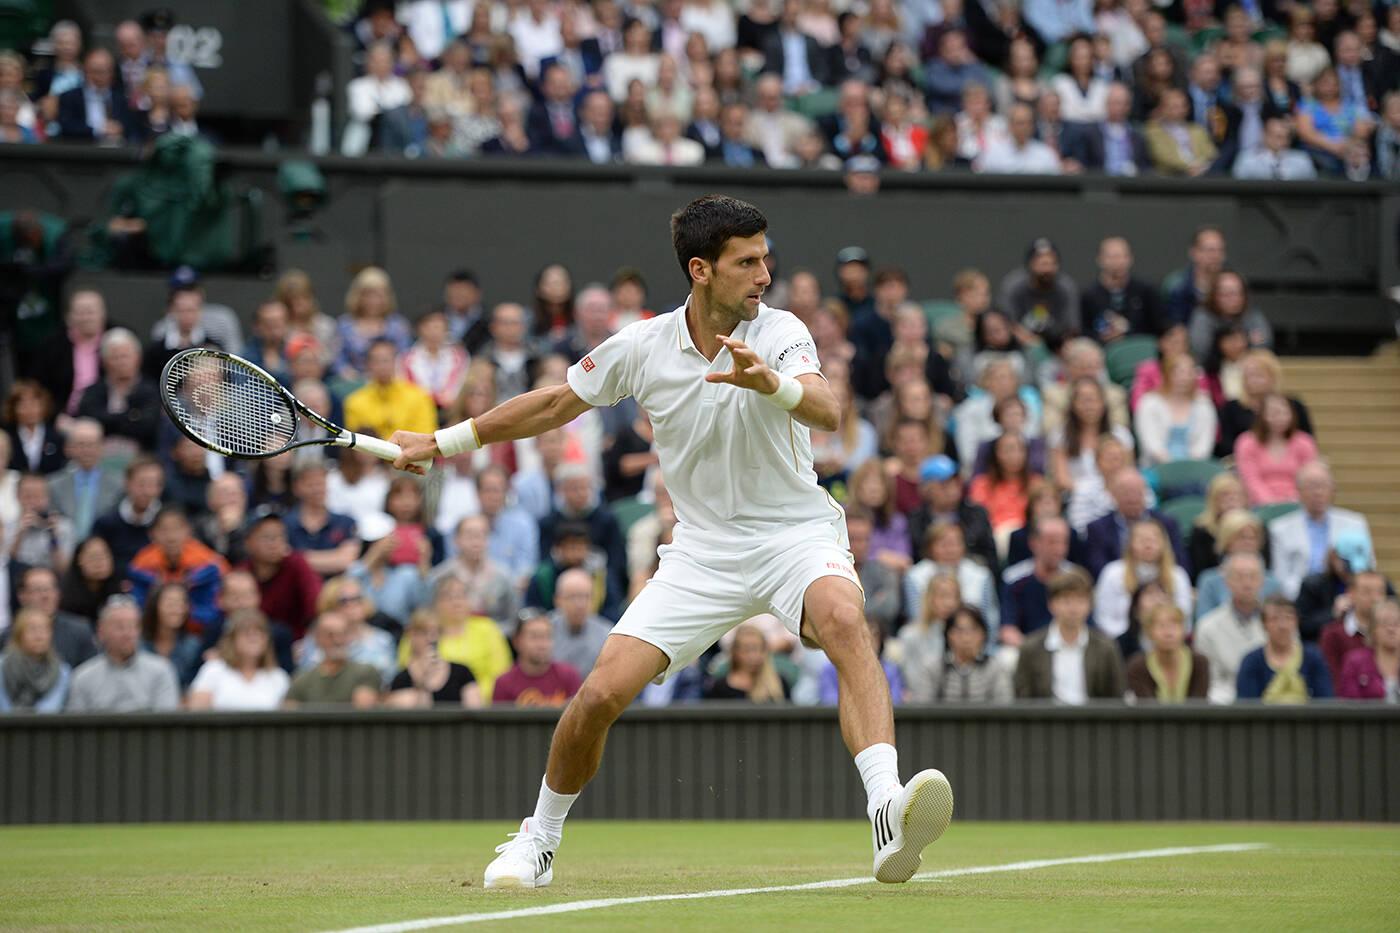 Foto: Divulgação/Wimbledon/Thomas Lovelock/AELTC